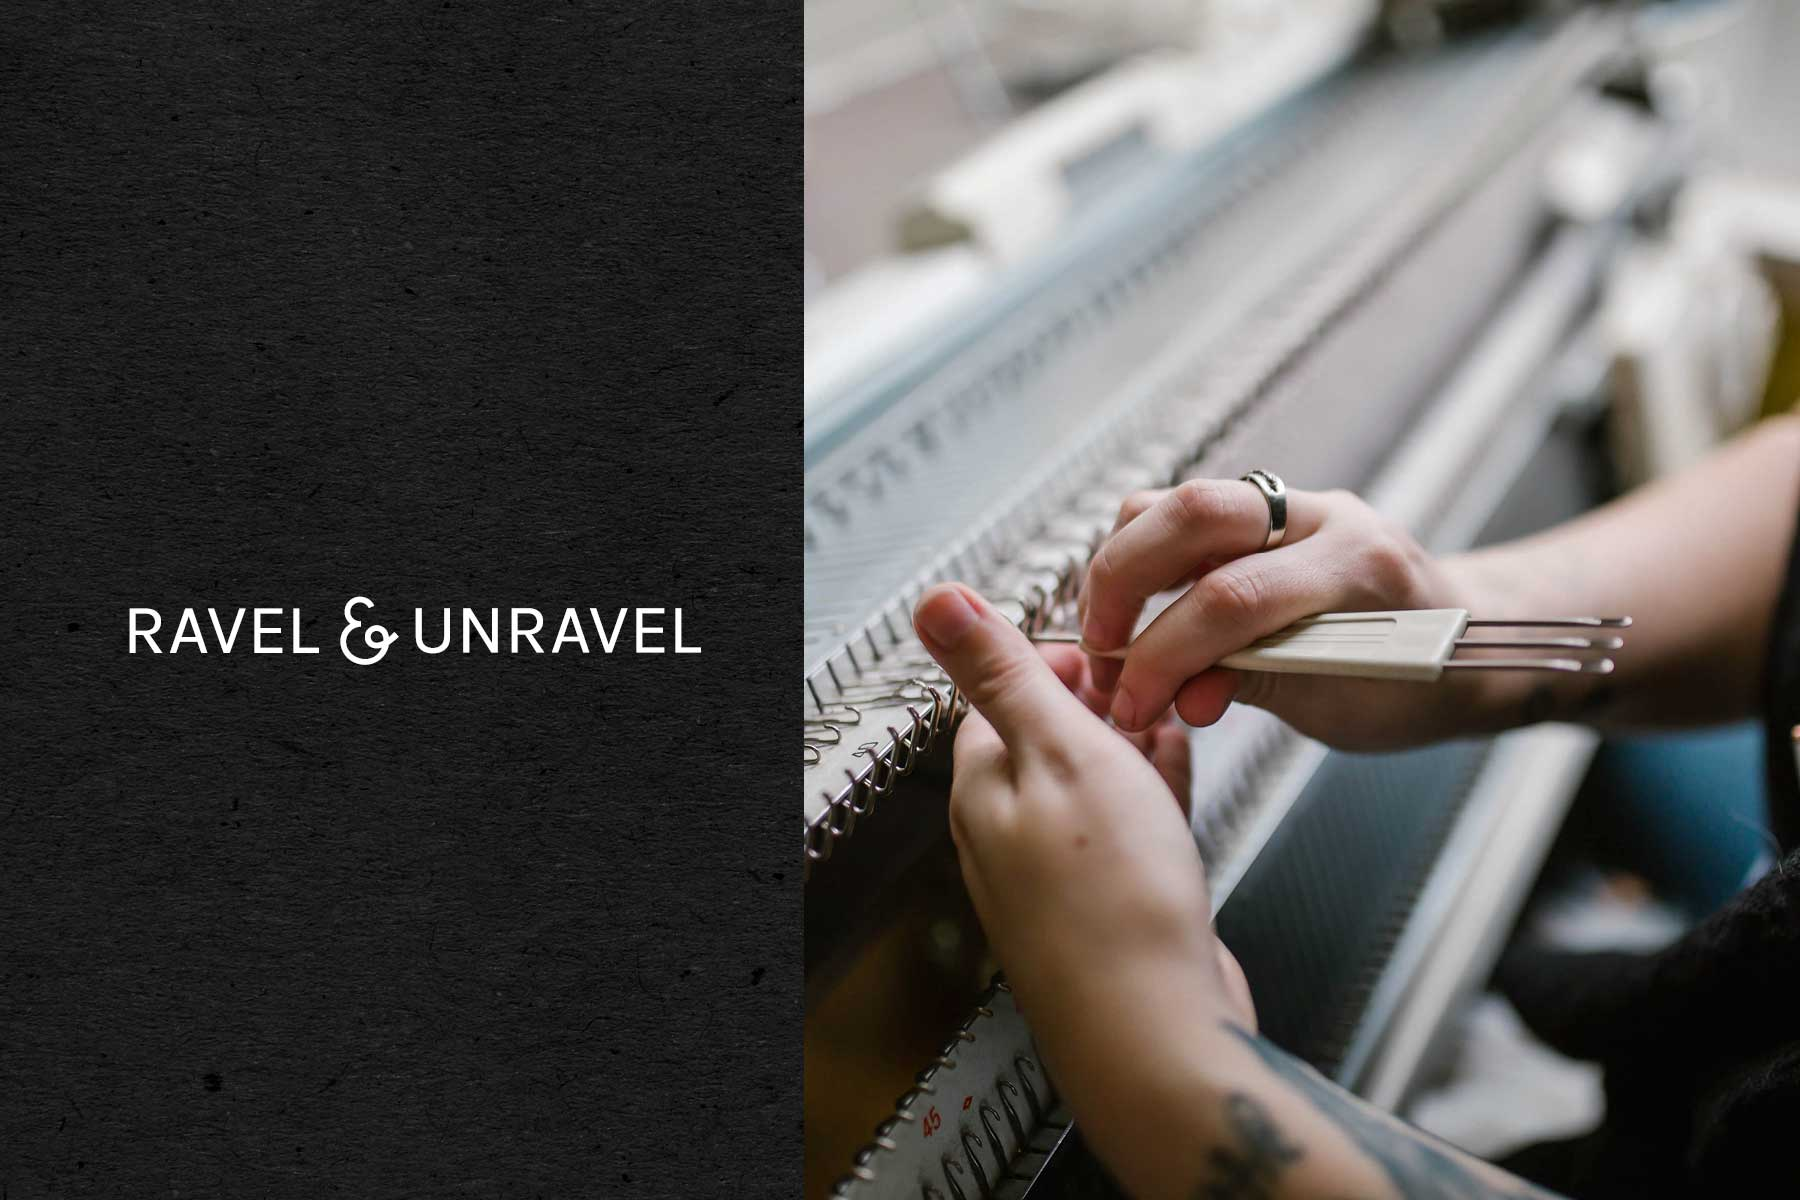 Ravel & Unravel